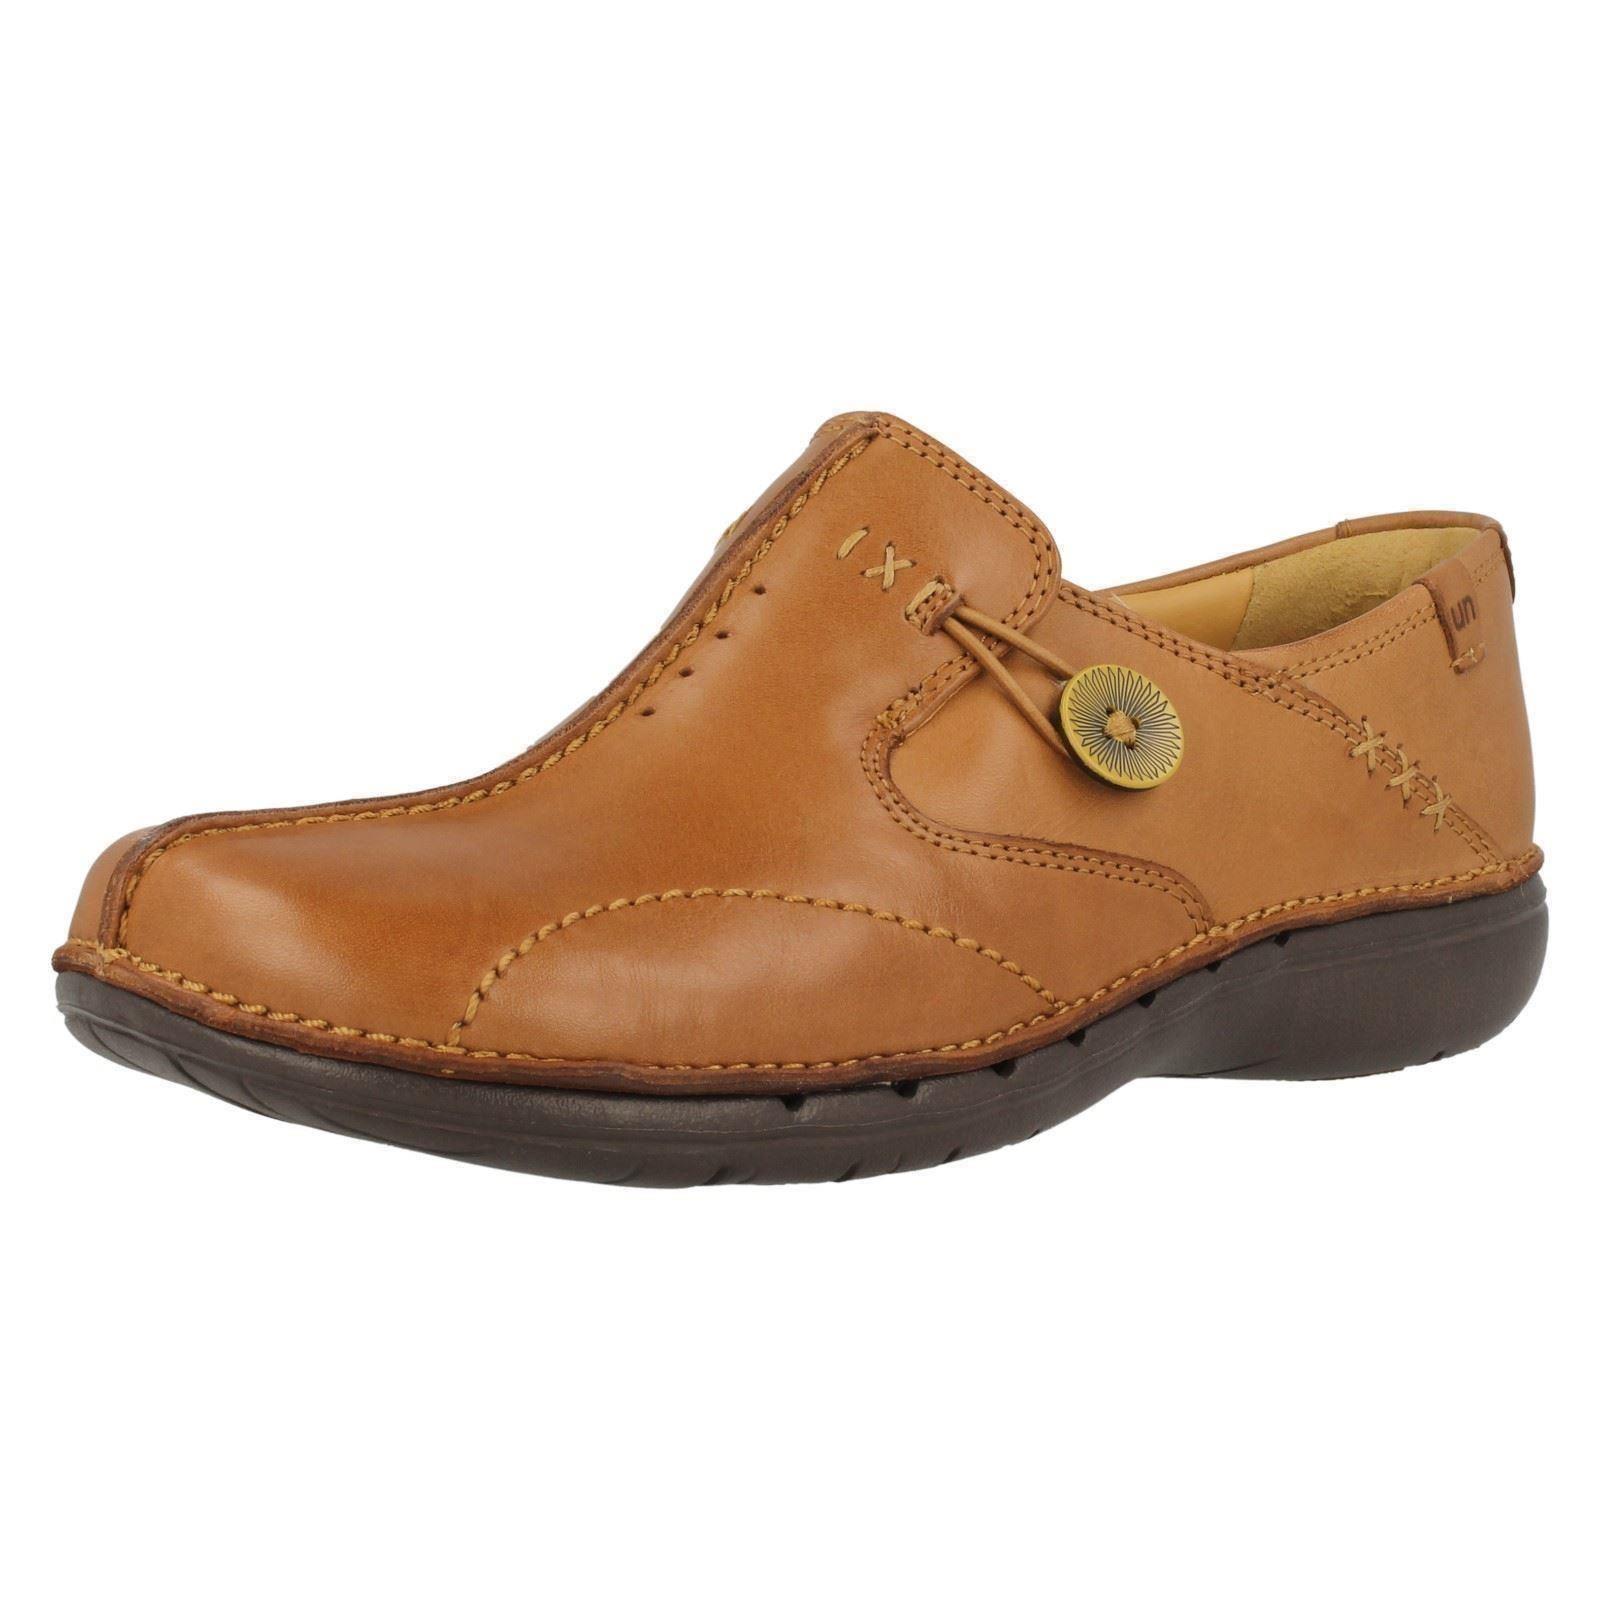 Clarks Ladies Un Loop Tan Shoes